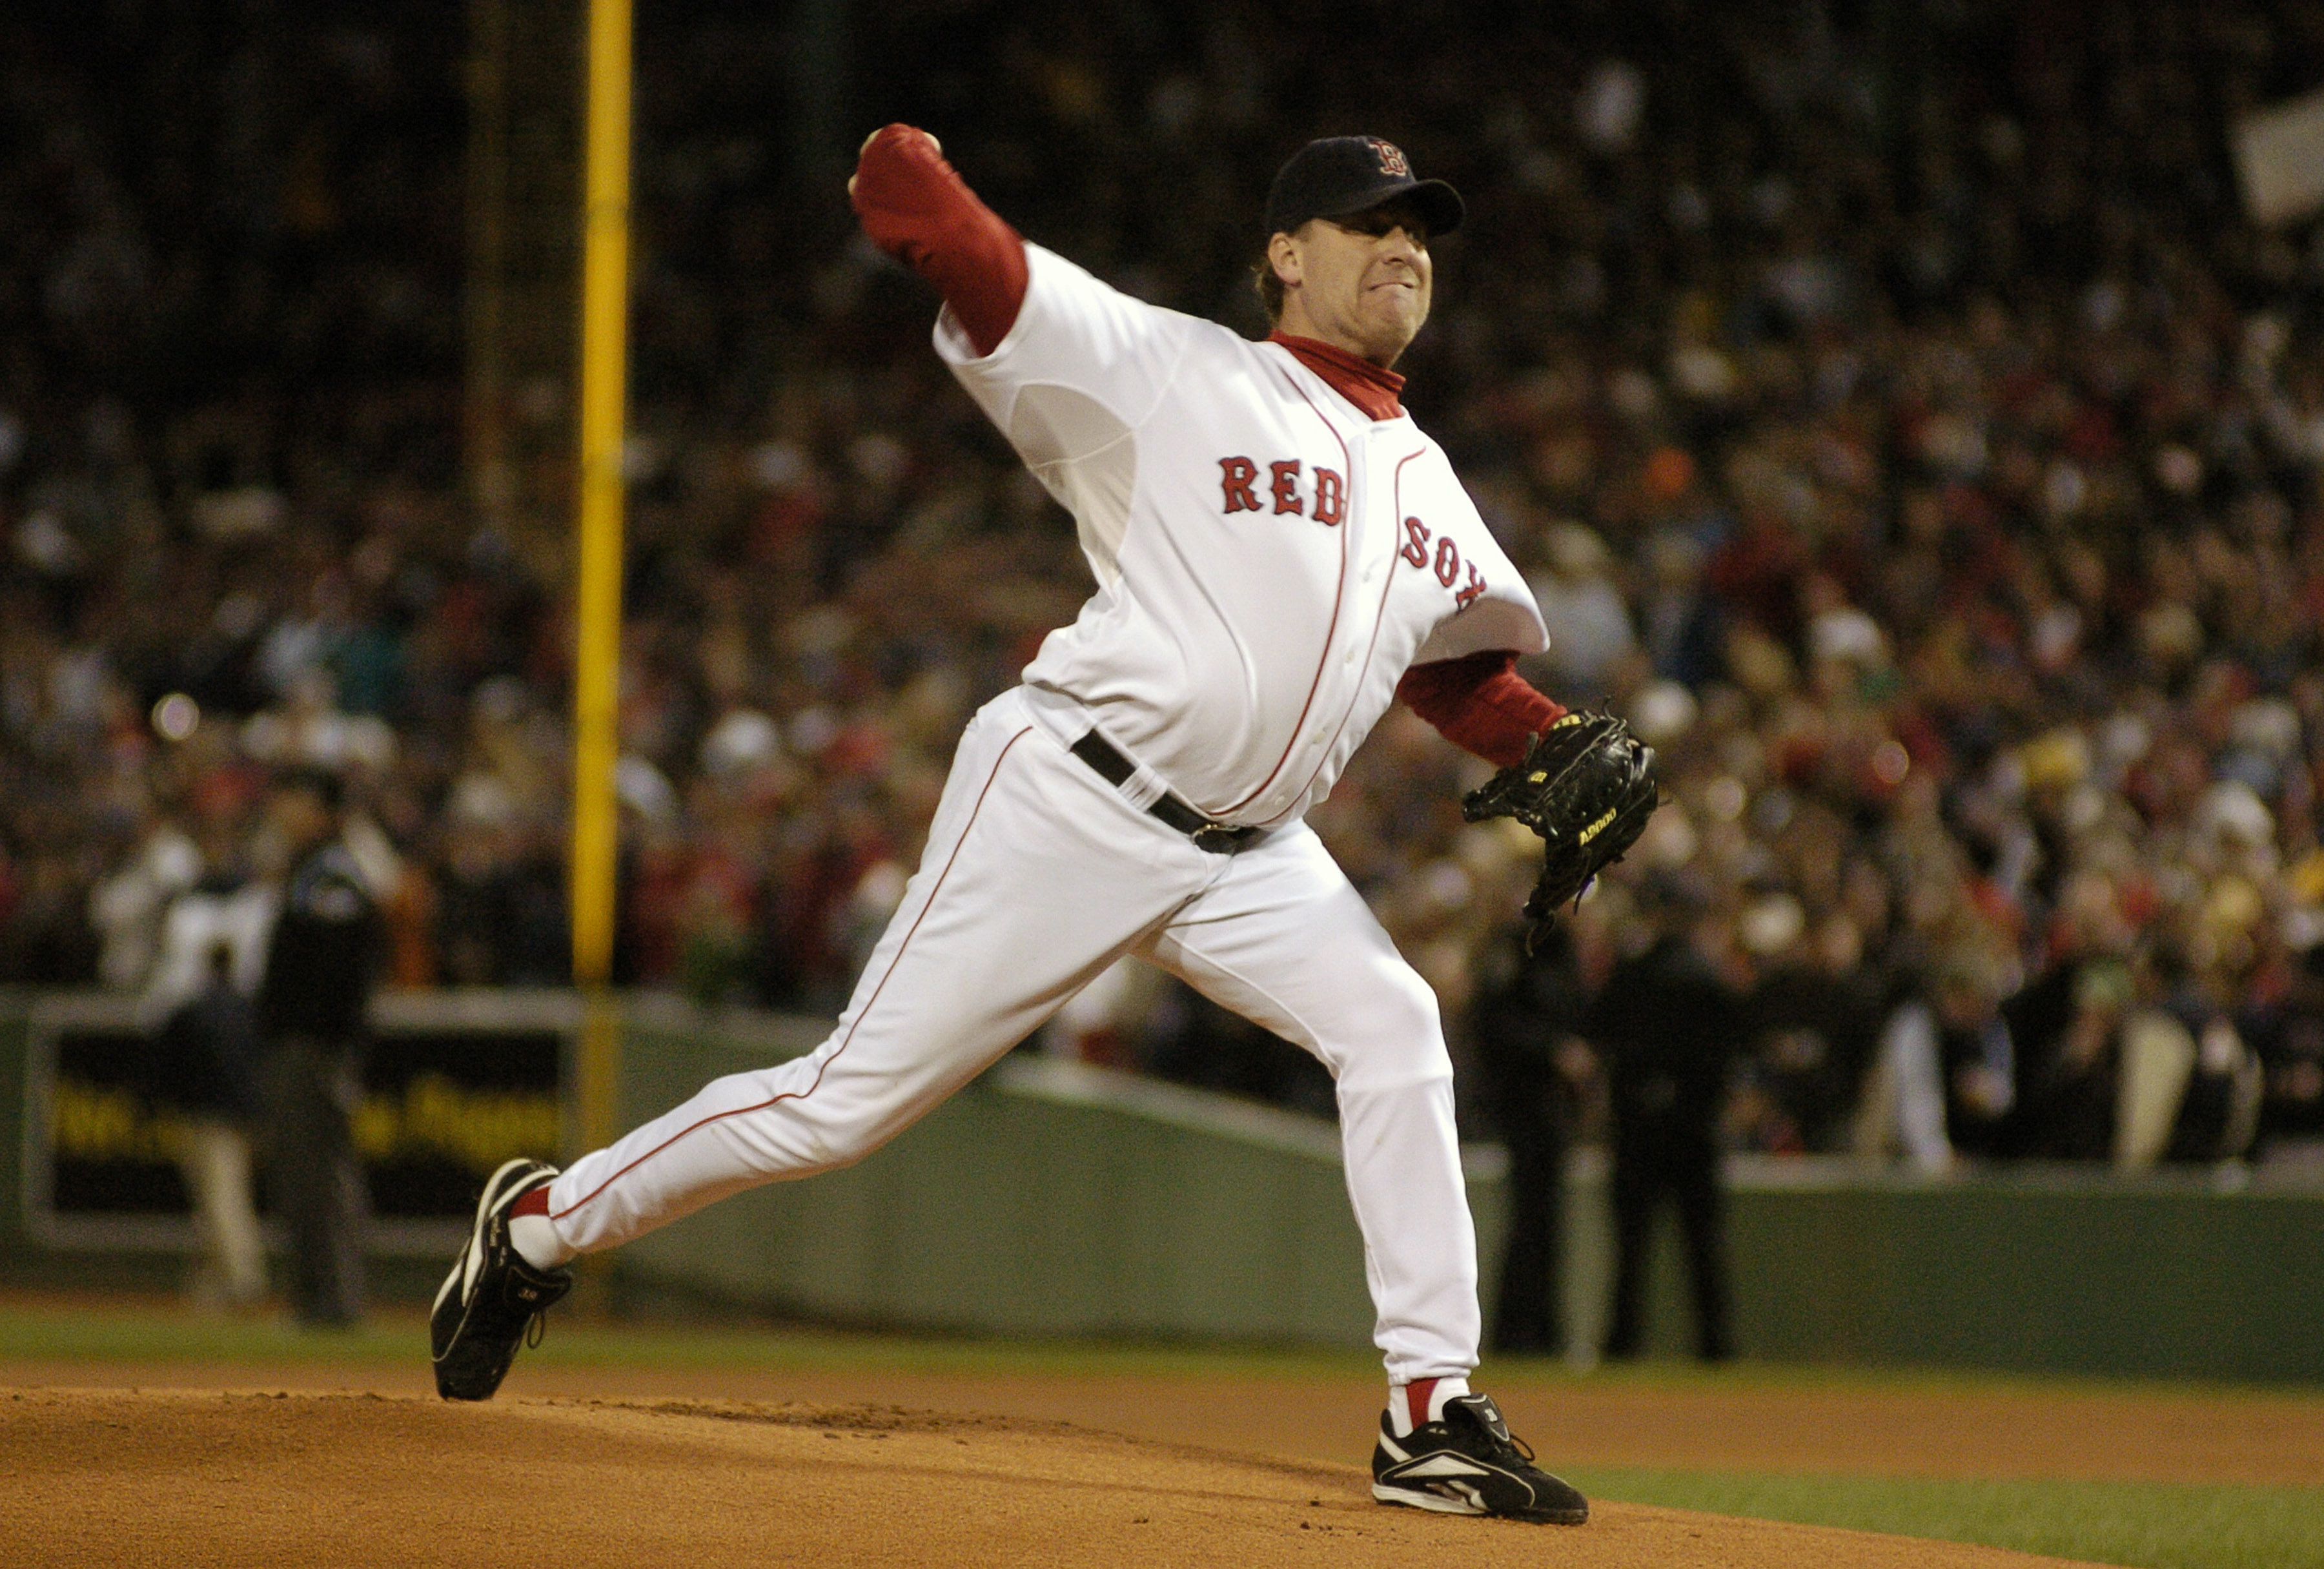 2007 World Series GM 2 - Colorado Rockies v Boston Red Sox